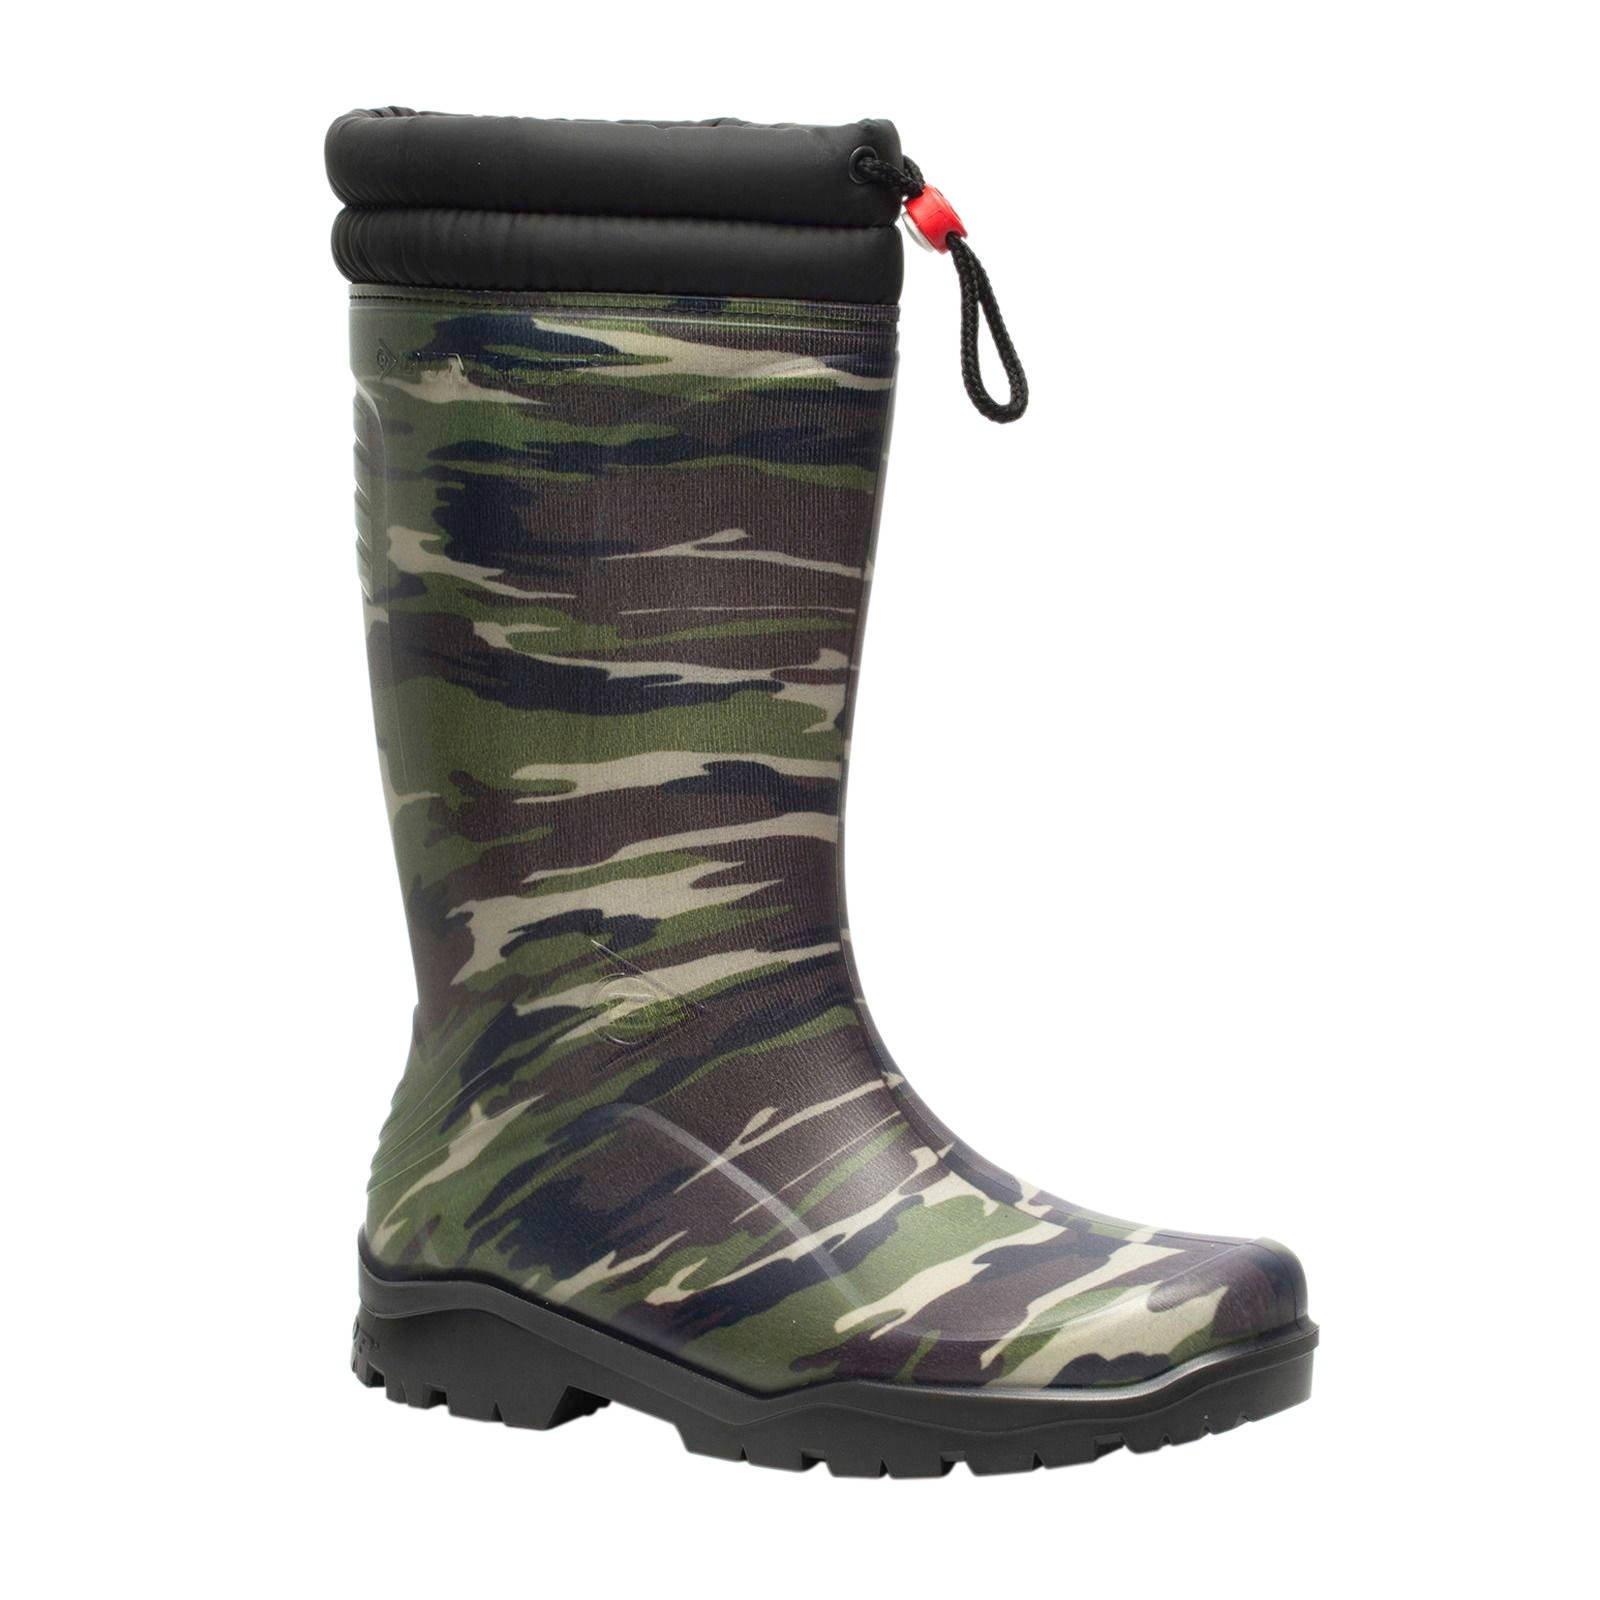 Dunlop Blizzard Thermo regenlaarzen | wehkamp